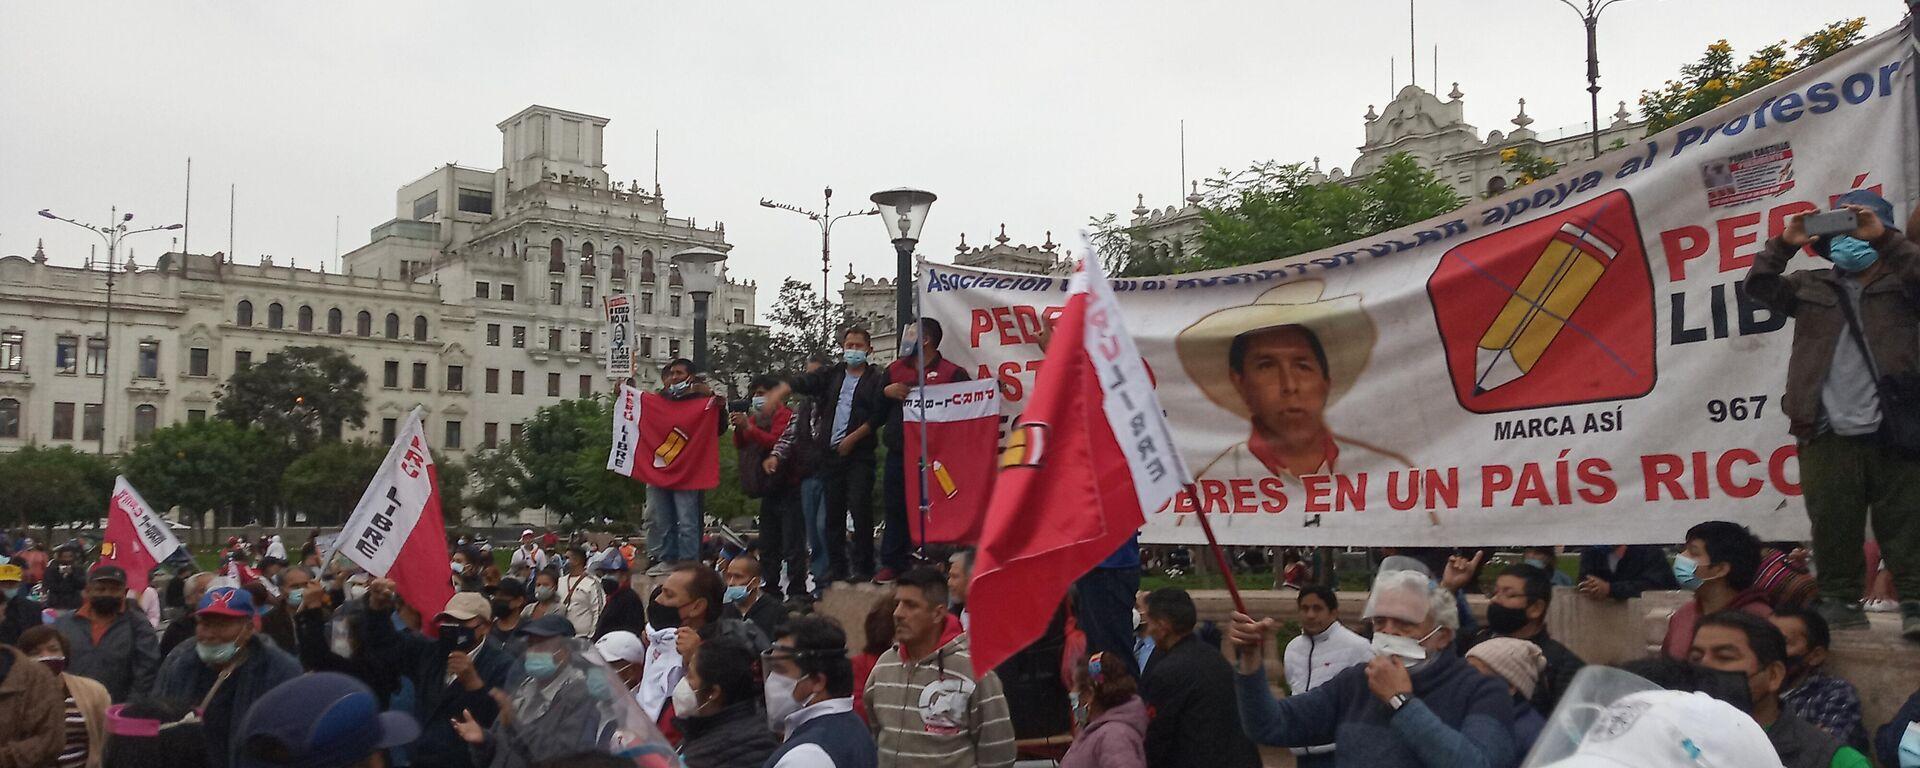 Acto a favor de Pedro Castillo en la plaza San Martín de Lima - Sputnik Mundo, 1920, 19.06.2021